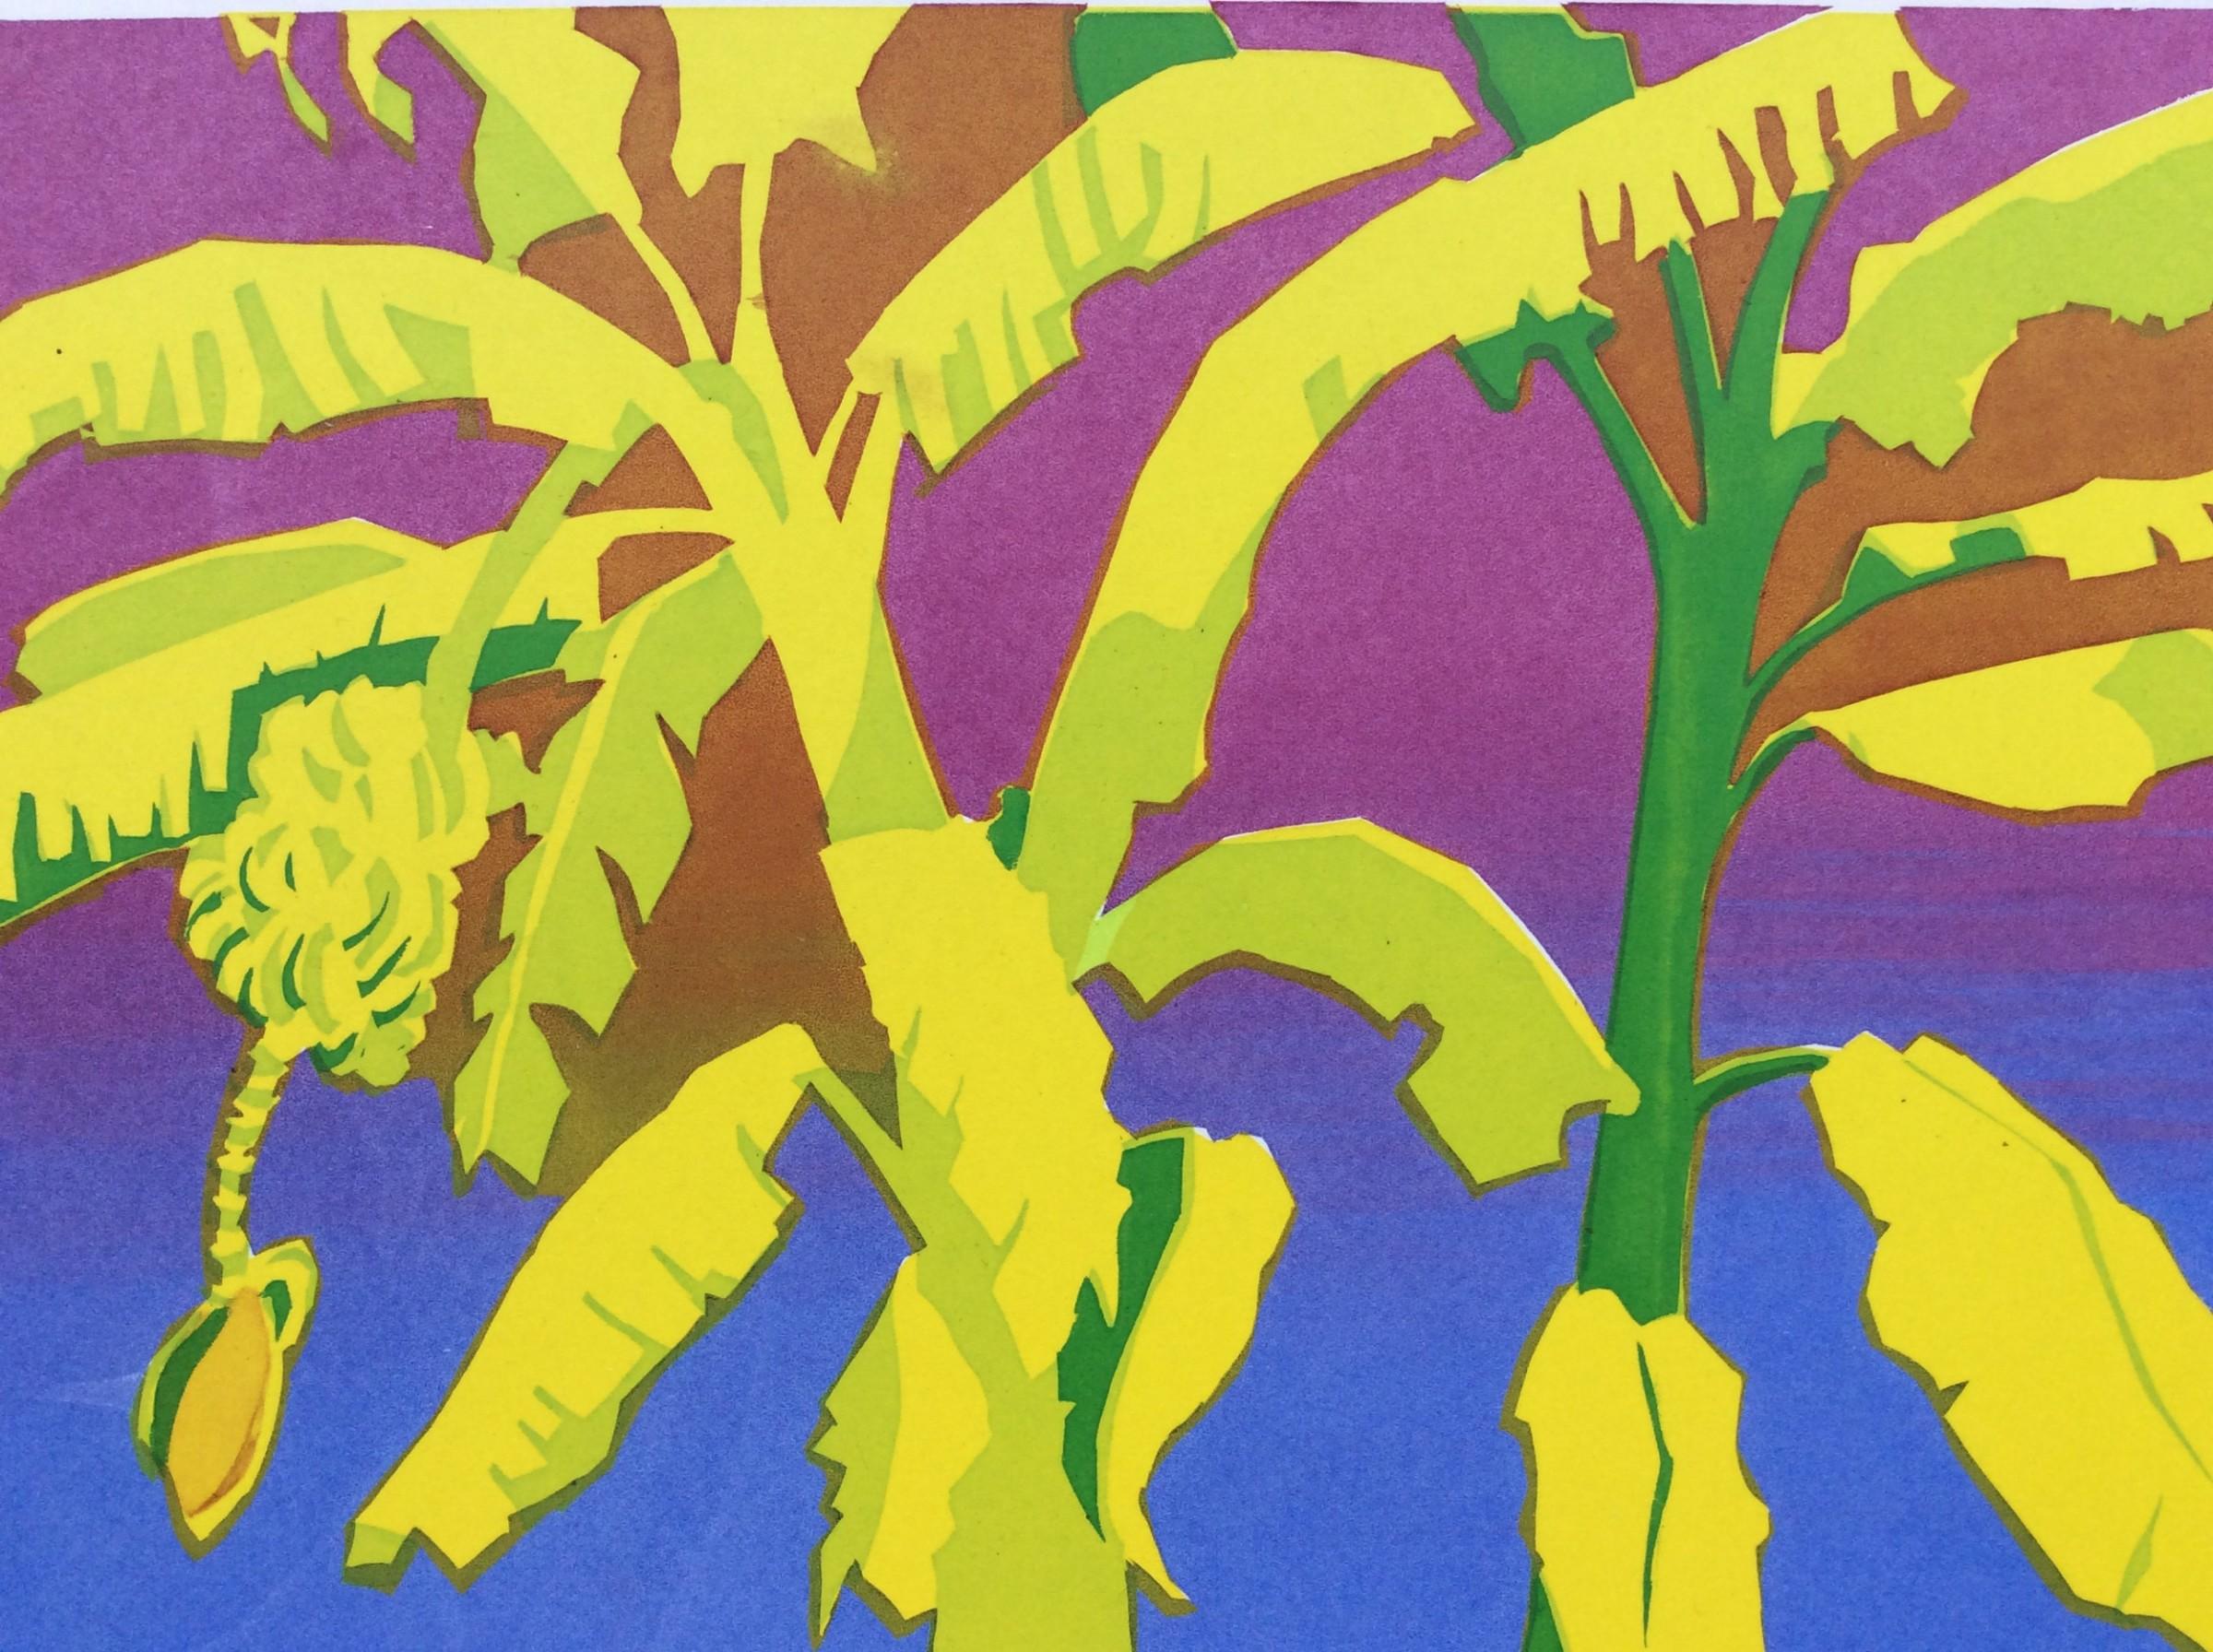 "<span class=""link fancybox-details-link""><a href=""/exhibitions/23/works/artworks_standalone11314/"">View Detail Page</a></span><div class=""artist""><span class=""artist""><strong>Margaret Sellars RE</strong></span></div><div class=""title""><em>Banana Plantation</em></div><div class=""medium"">silkscreen</div><div class=""dimensions"">35 x 50 cm paper size<br>21 x 30 cm image size</div><div class=""edition_details"">edition of 10</div>"